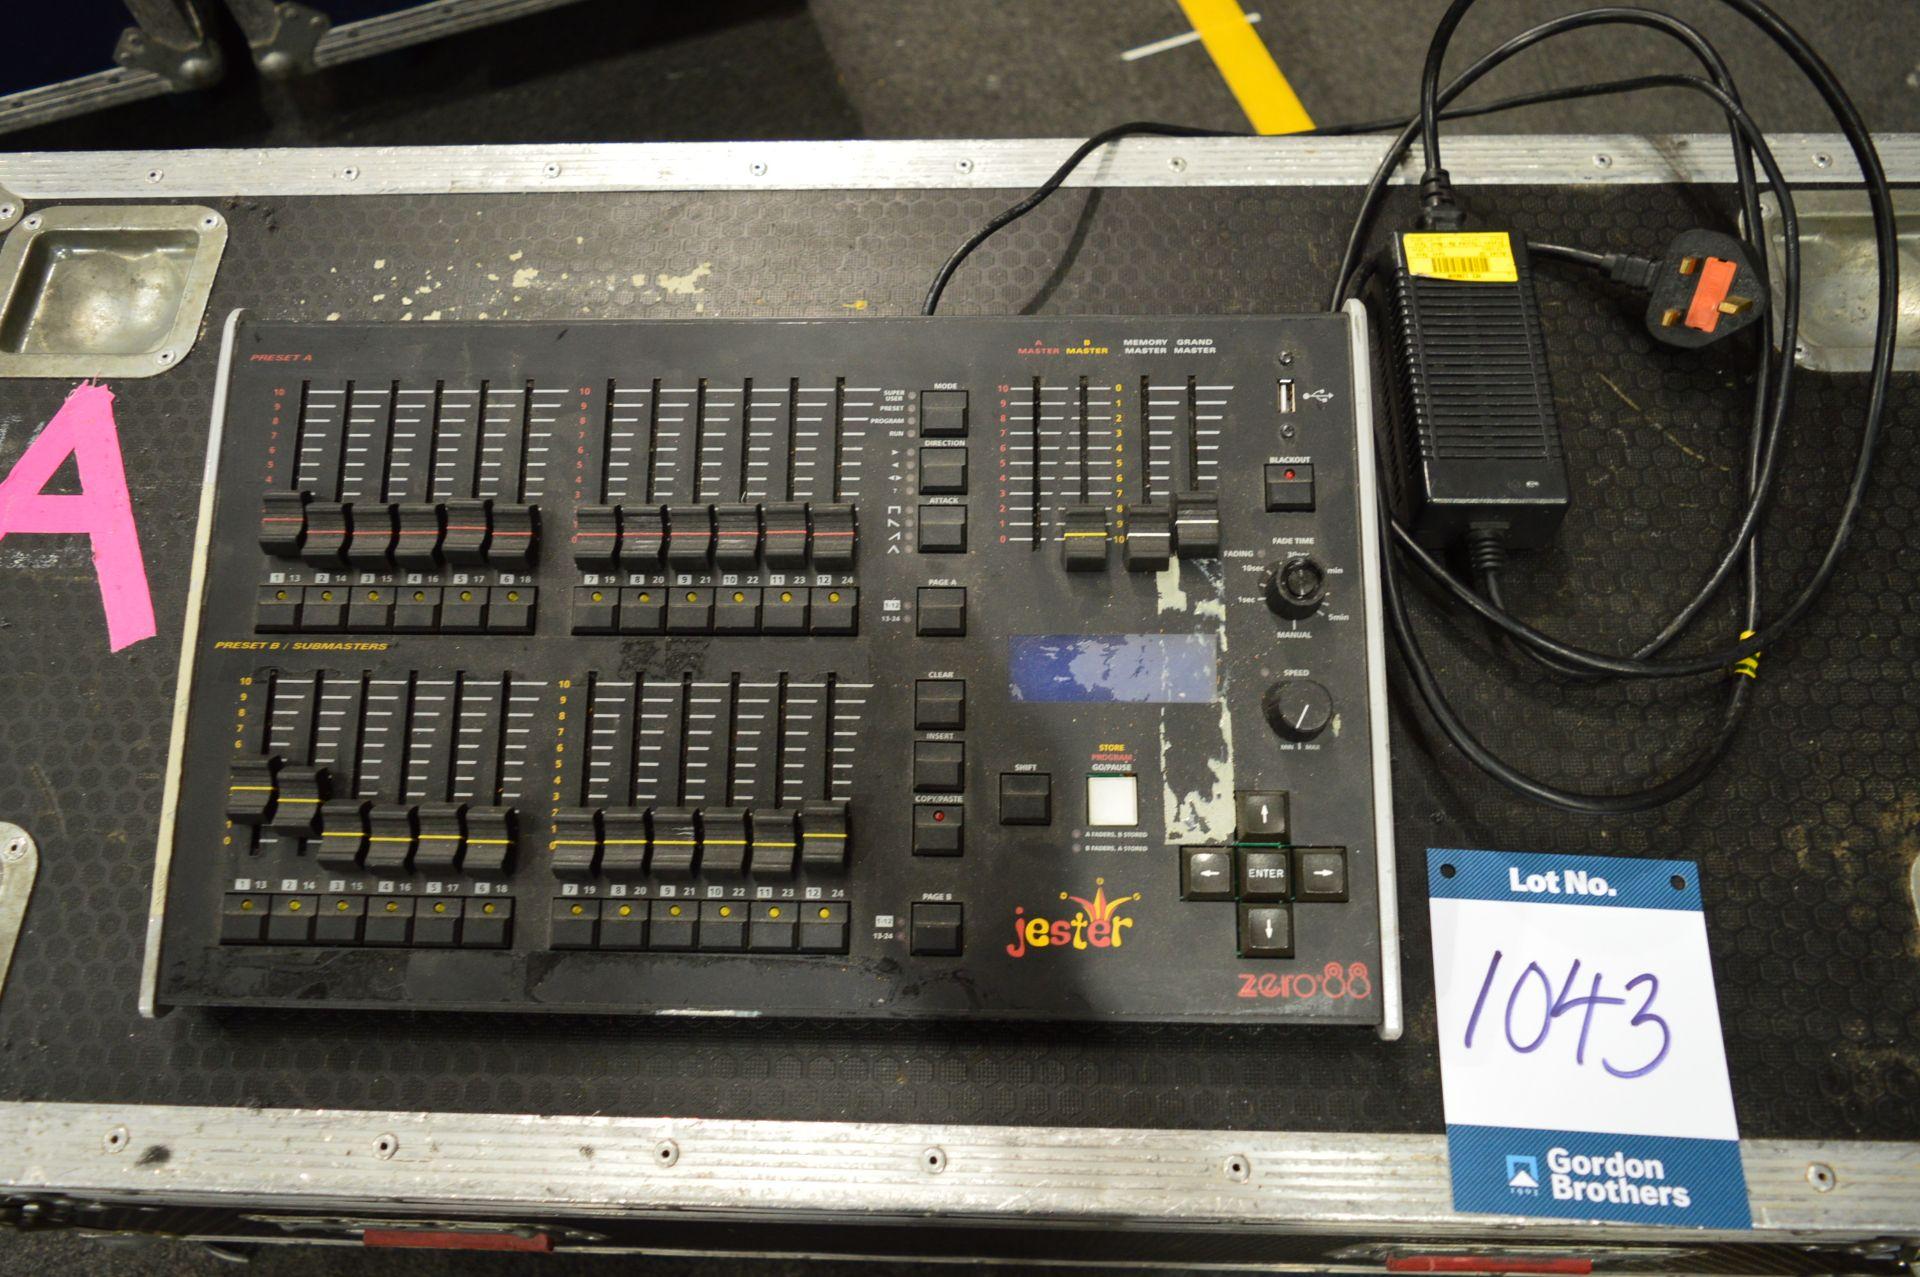 Lot 1043 - Zero88, Jester 12/24 lighting console controller,